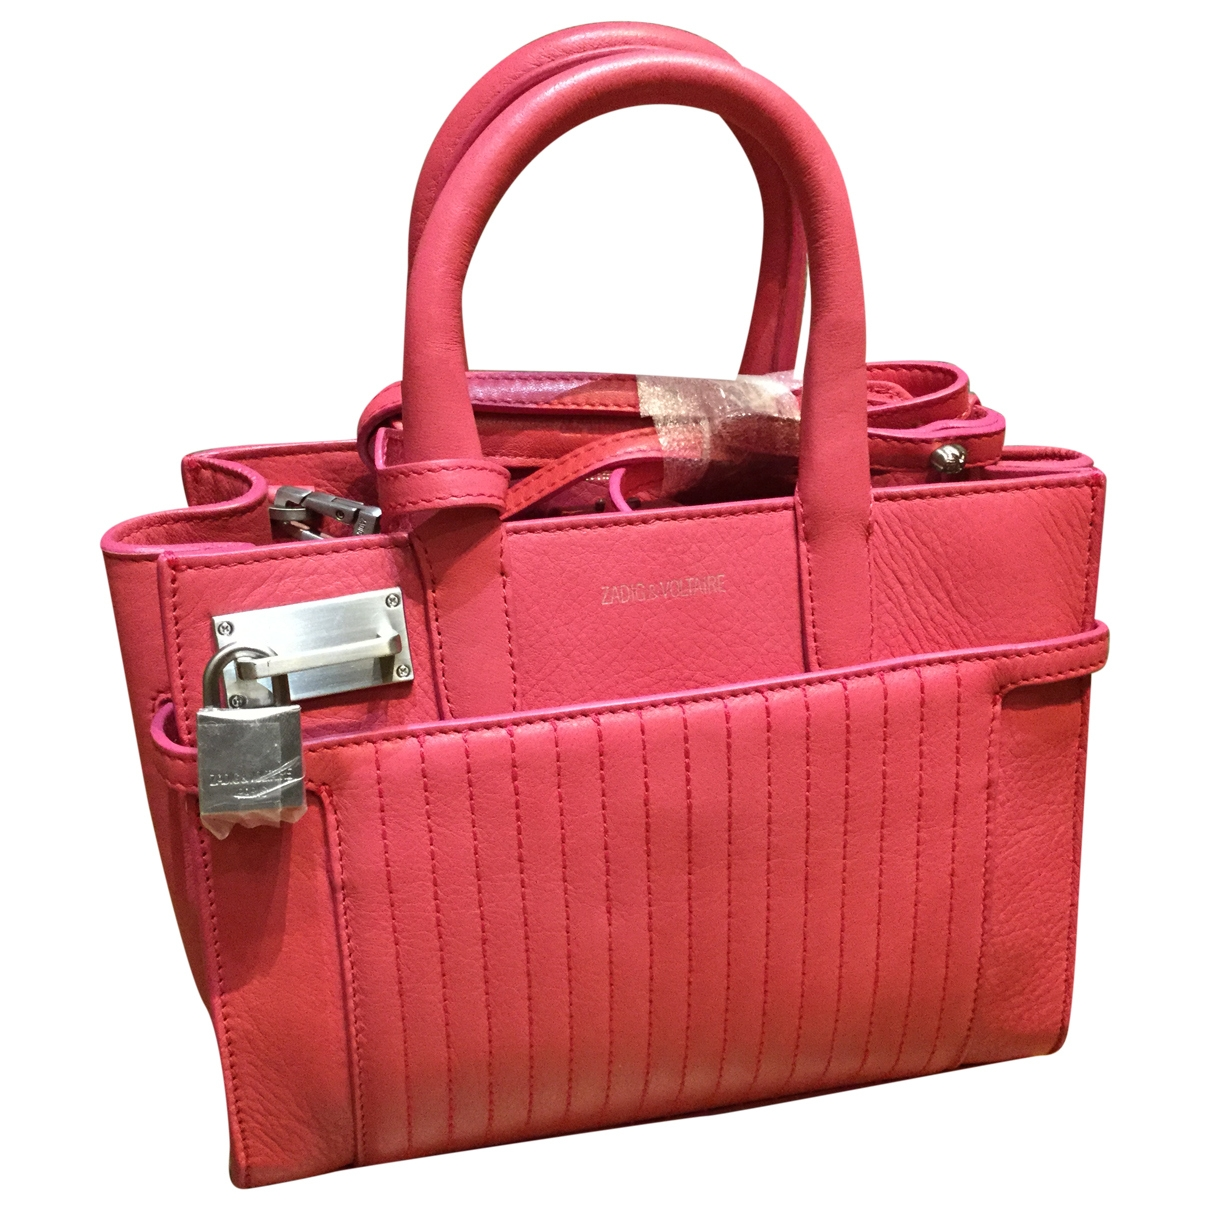 Zadig & Voltaire Candide Handtasche in  Rosa Leder